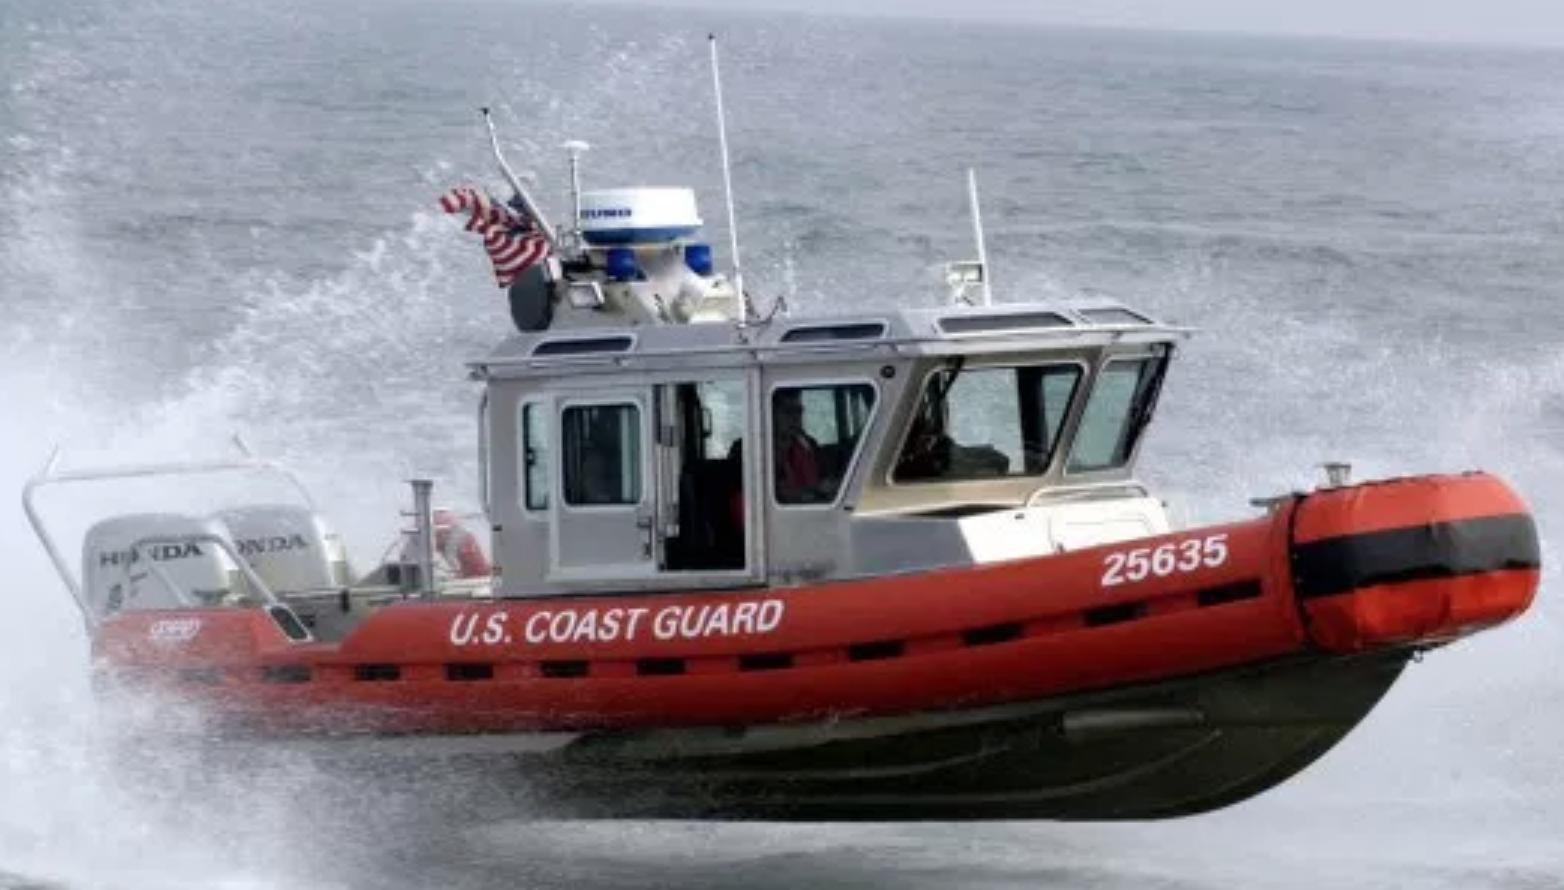 4 injured in N.J. boat crash, authorities say